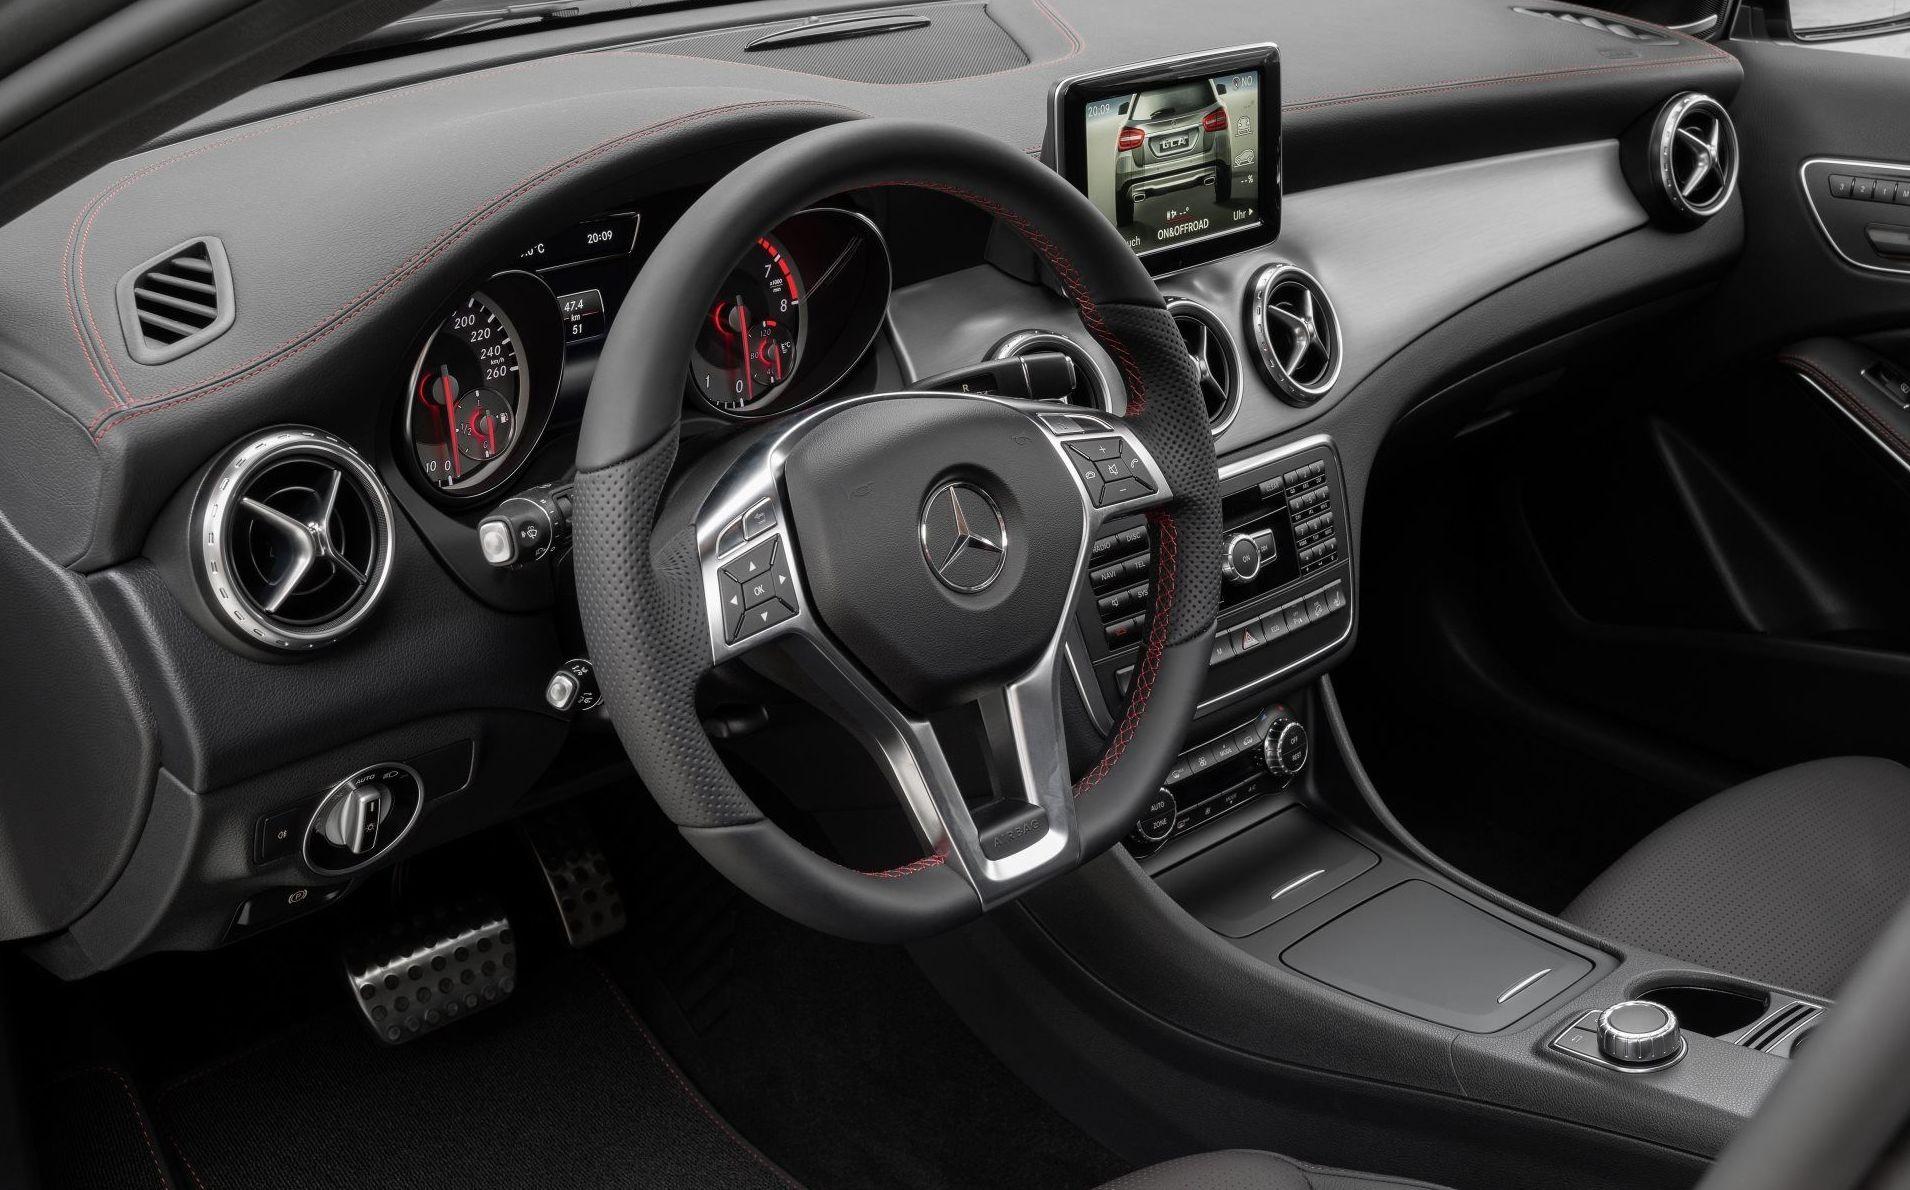 Reparación cuadro instrumentos tablero relojes Mercedes Audi VW Seat Skoda BMP Porsche